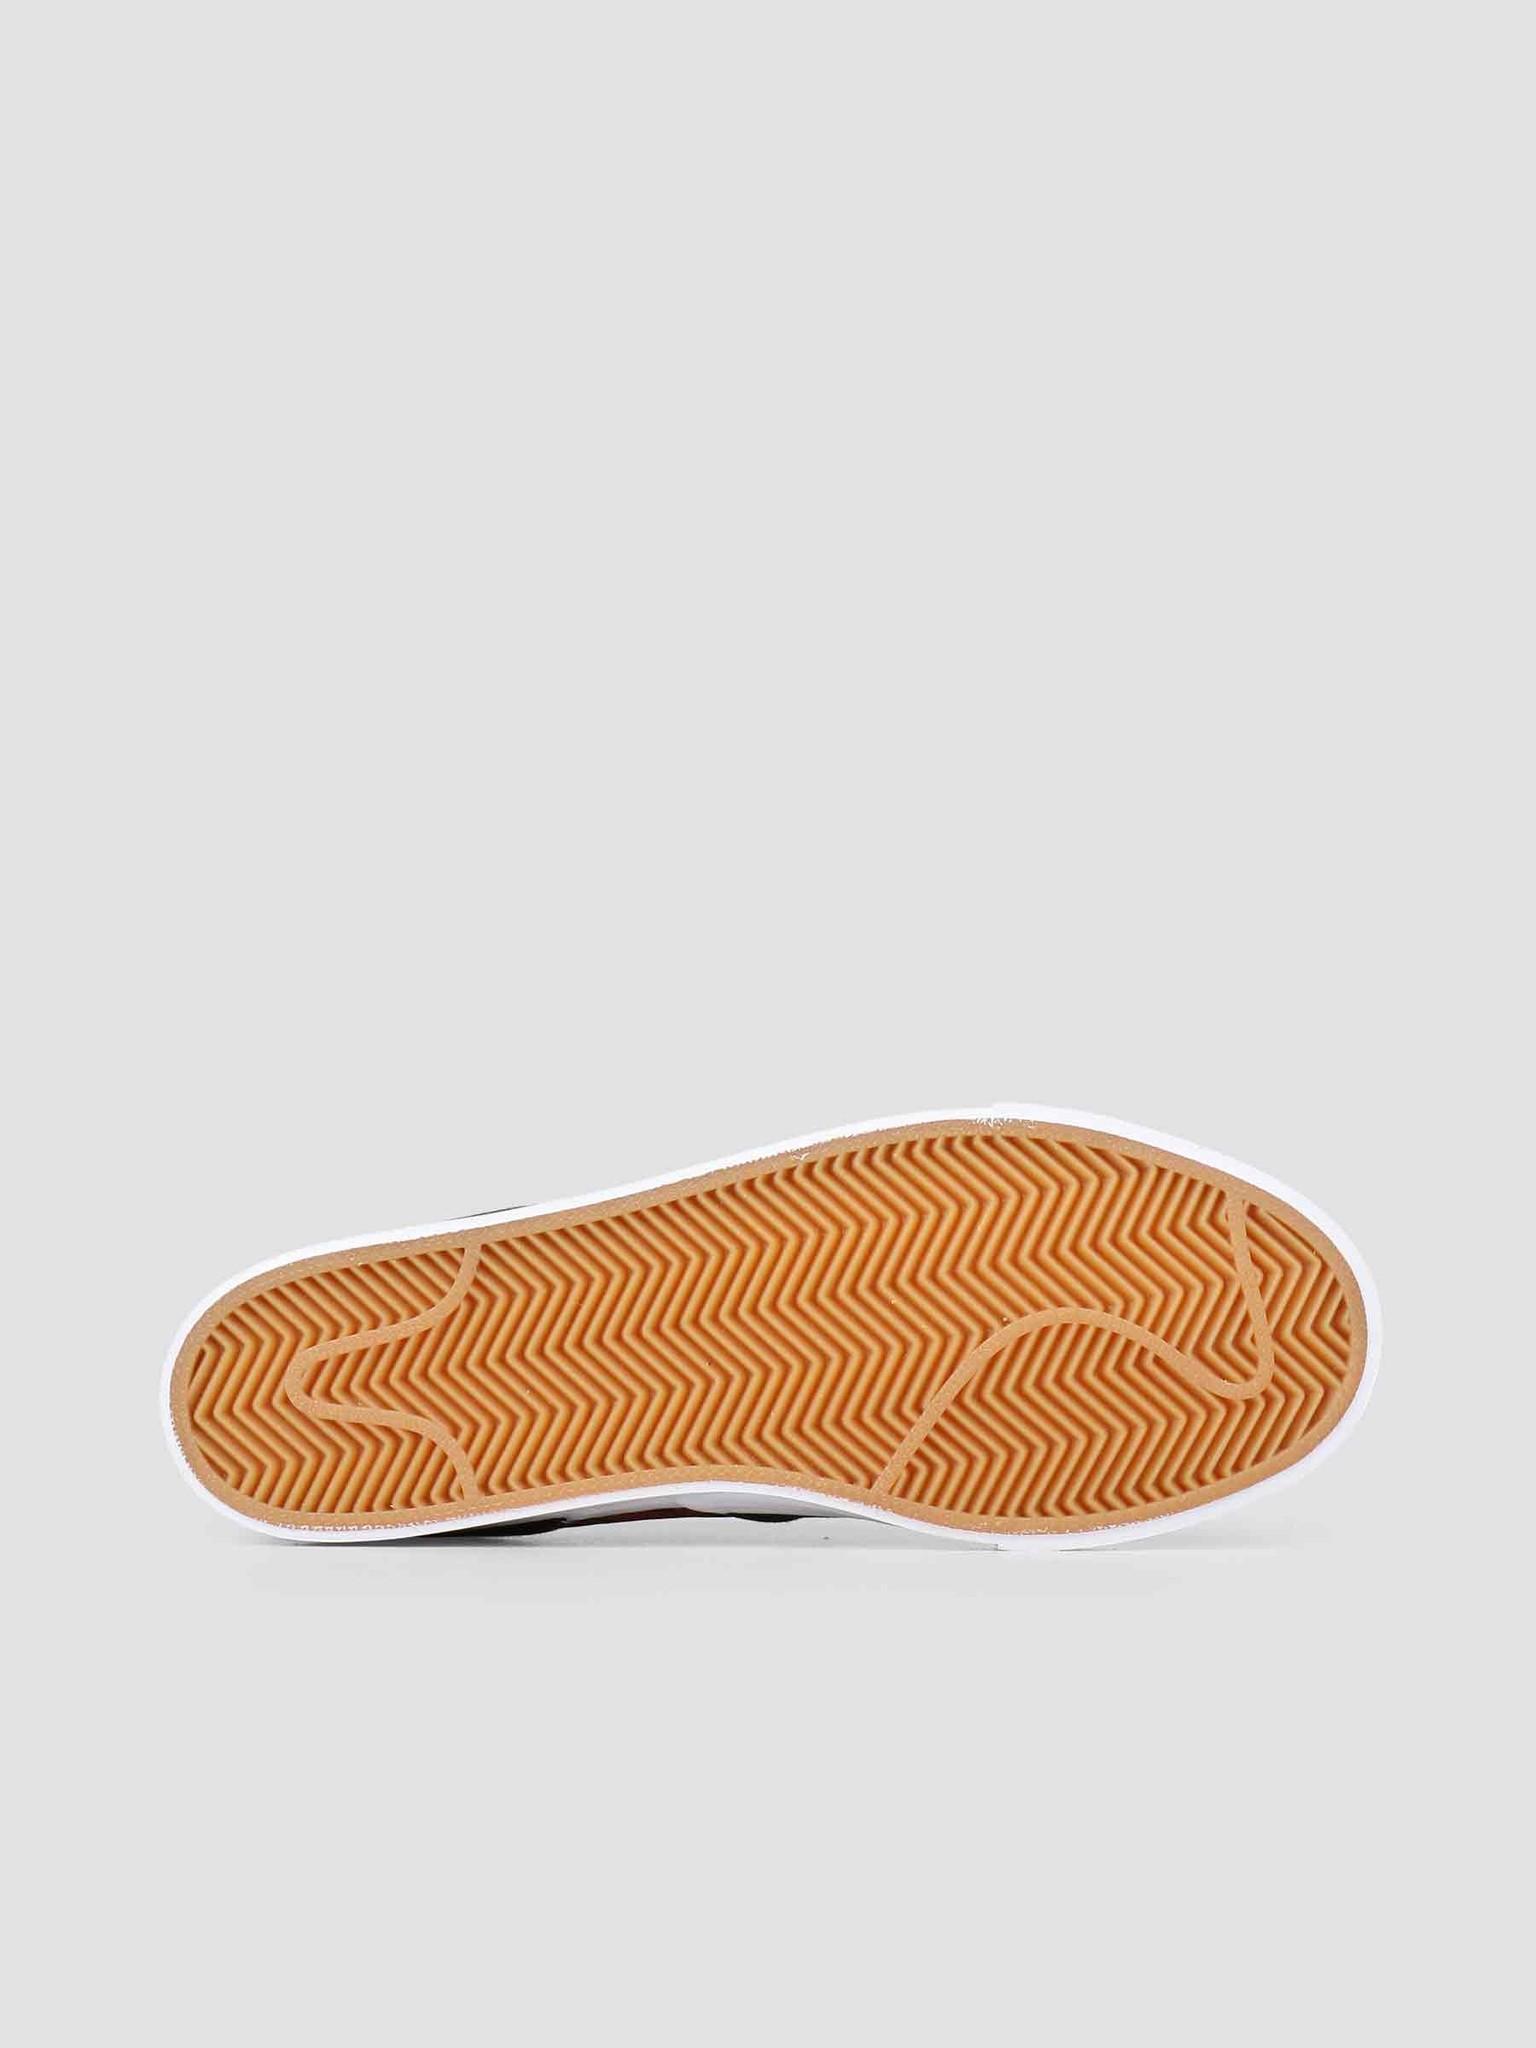 Nike Nike Sb Zoom Stefan Janoski Slip Premium Skateboarding Velvet Brown 833582-200